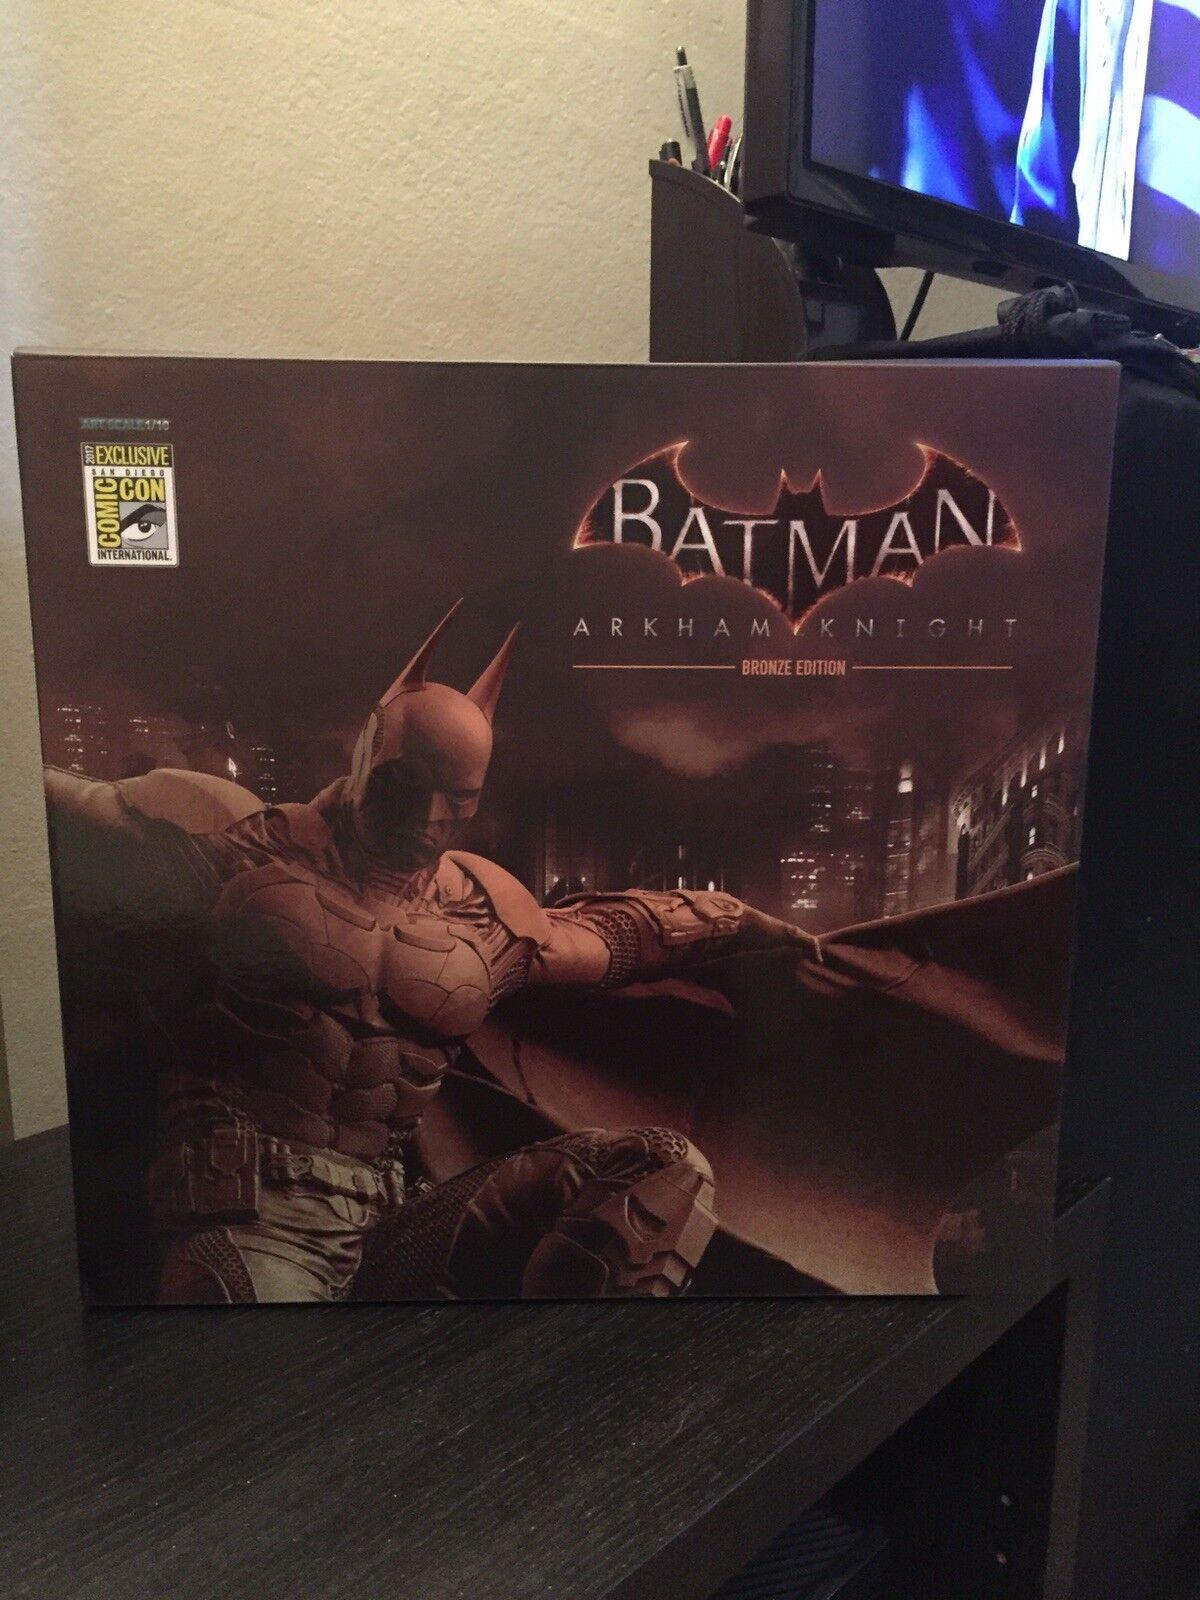 SDCC 2017 Exclusive Iron Studios BATMAN  Arkham Knight  Bronze Edition